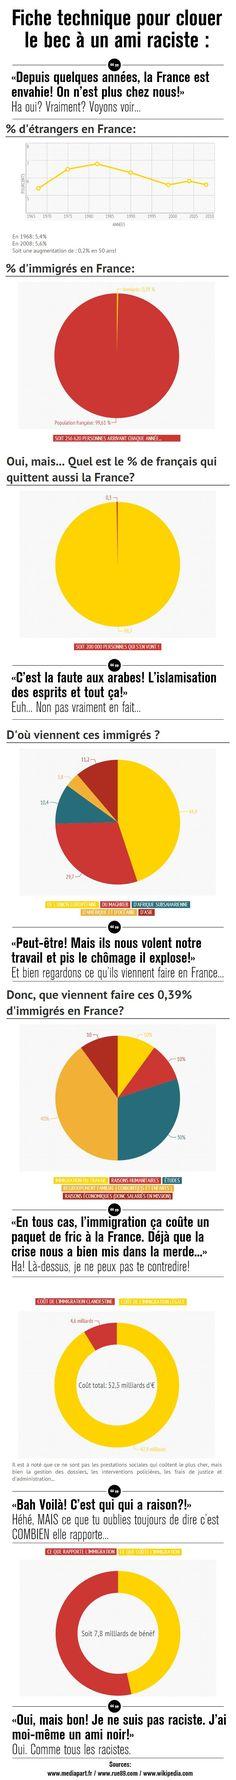 Statistiques de l'immigration en France